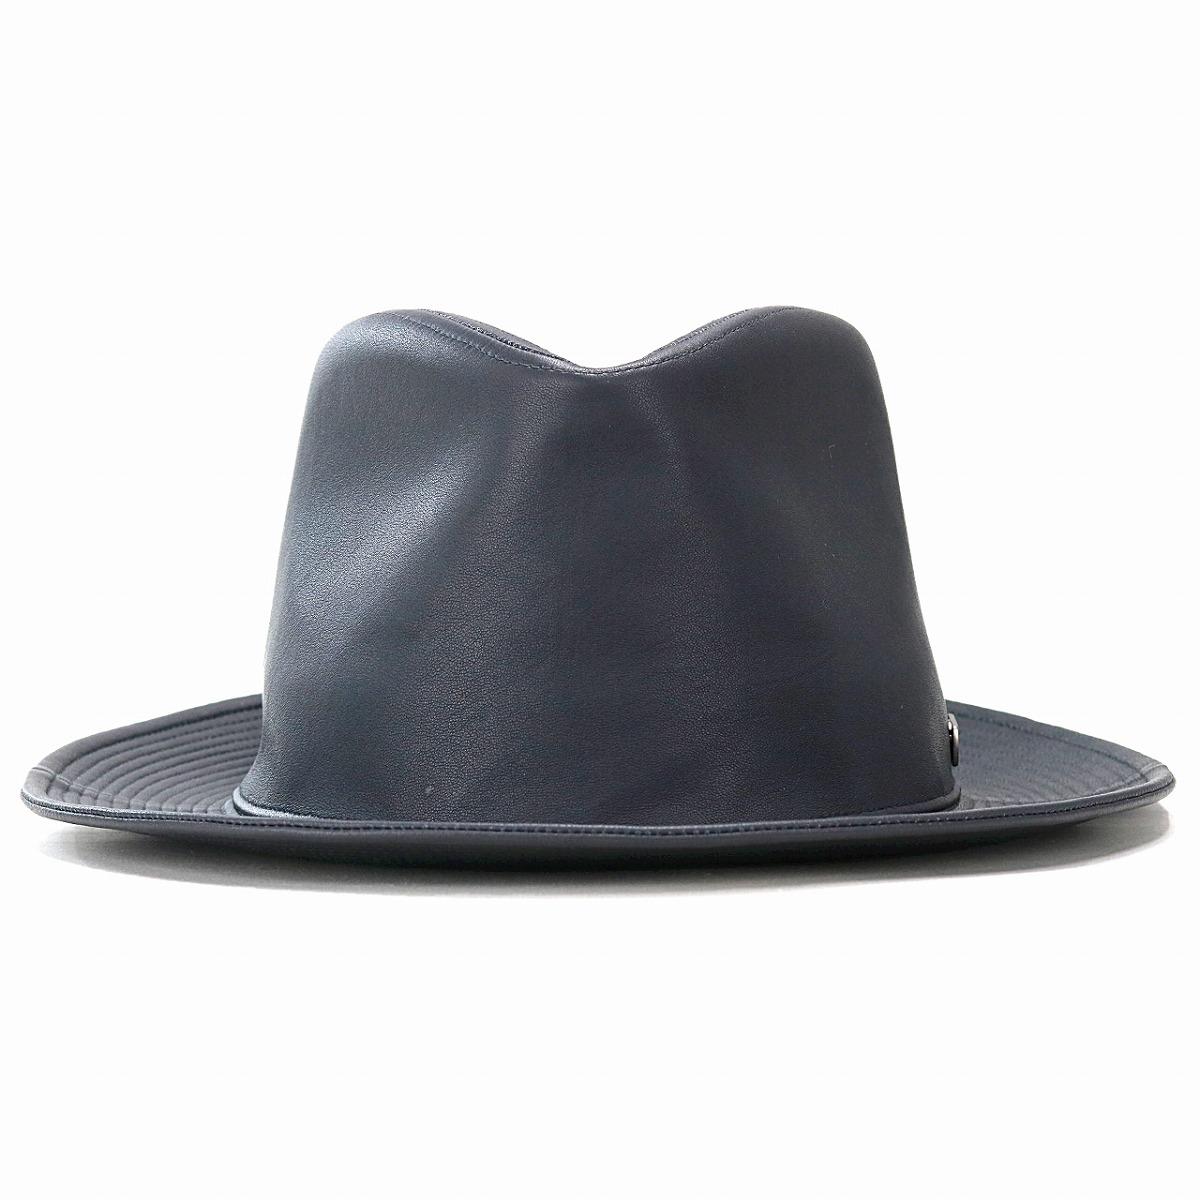 ... 58cm 60cm STETSON gentleman soft felt hat Shin pull gray black black   fedora  stetson ... efd4277cba6